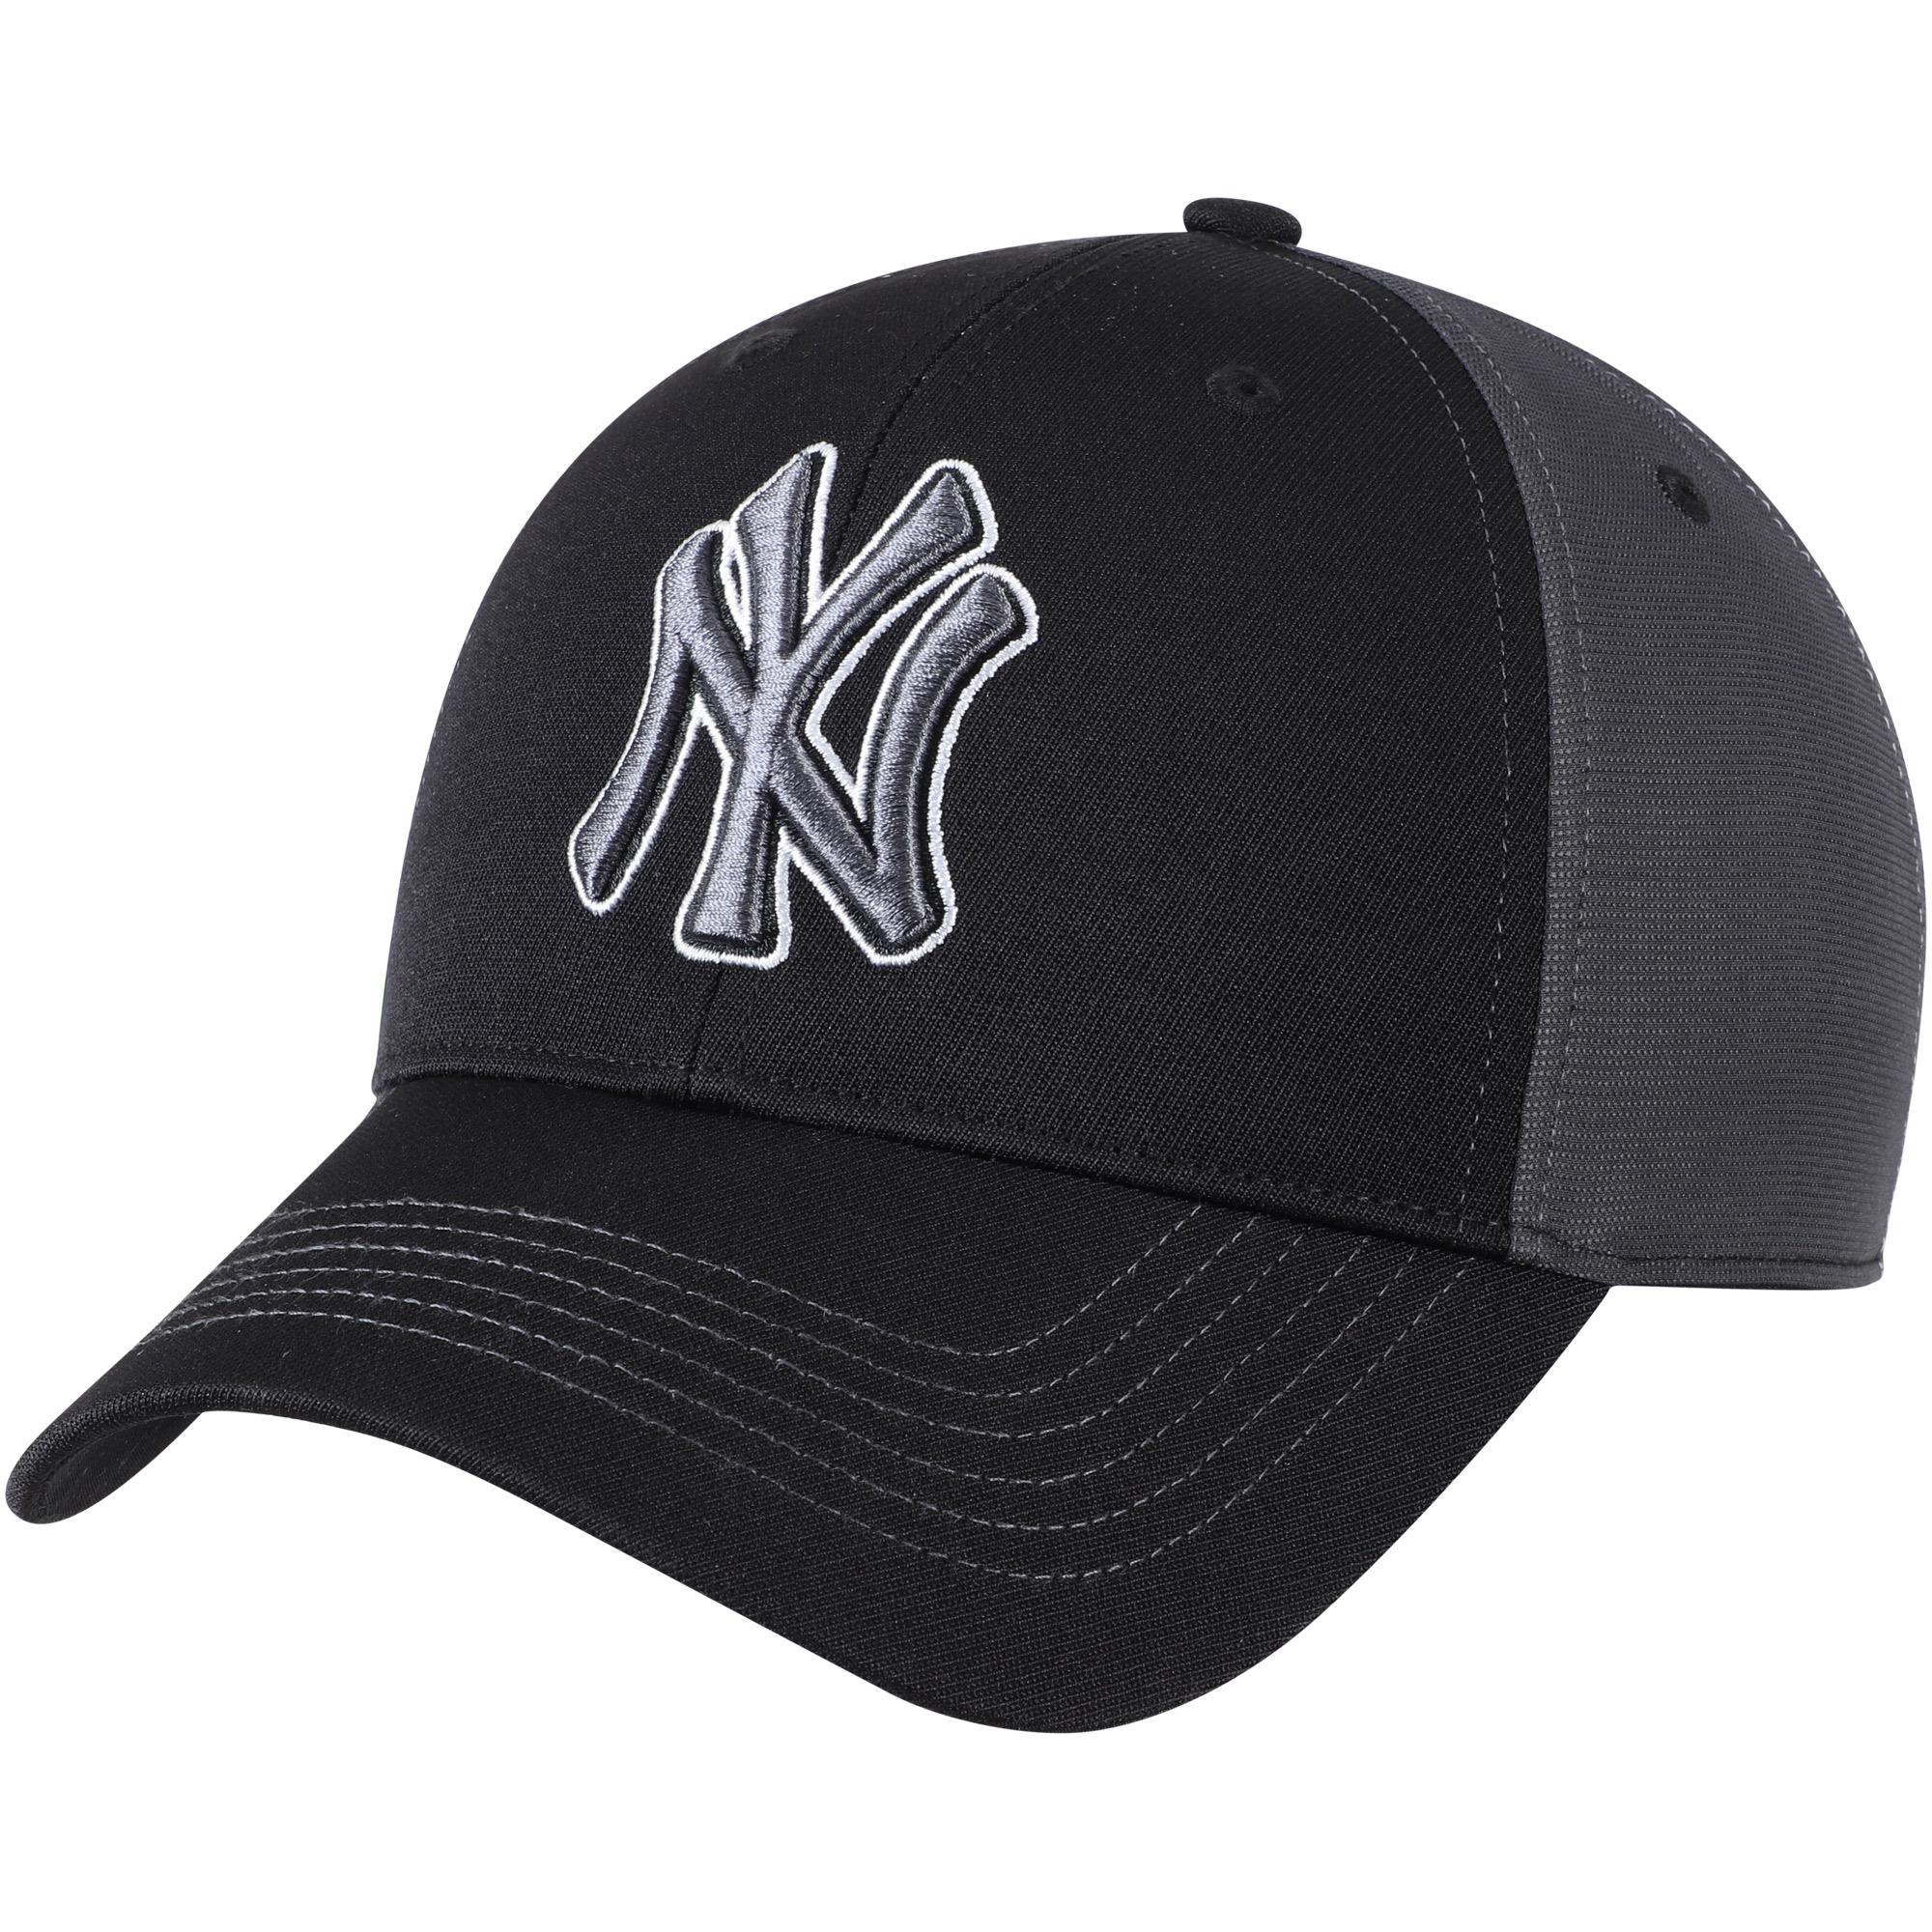 bc897d650b1 MLB Products and MLB Apparel - Walmart.com